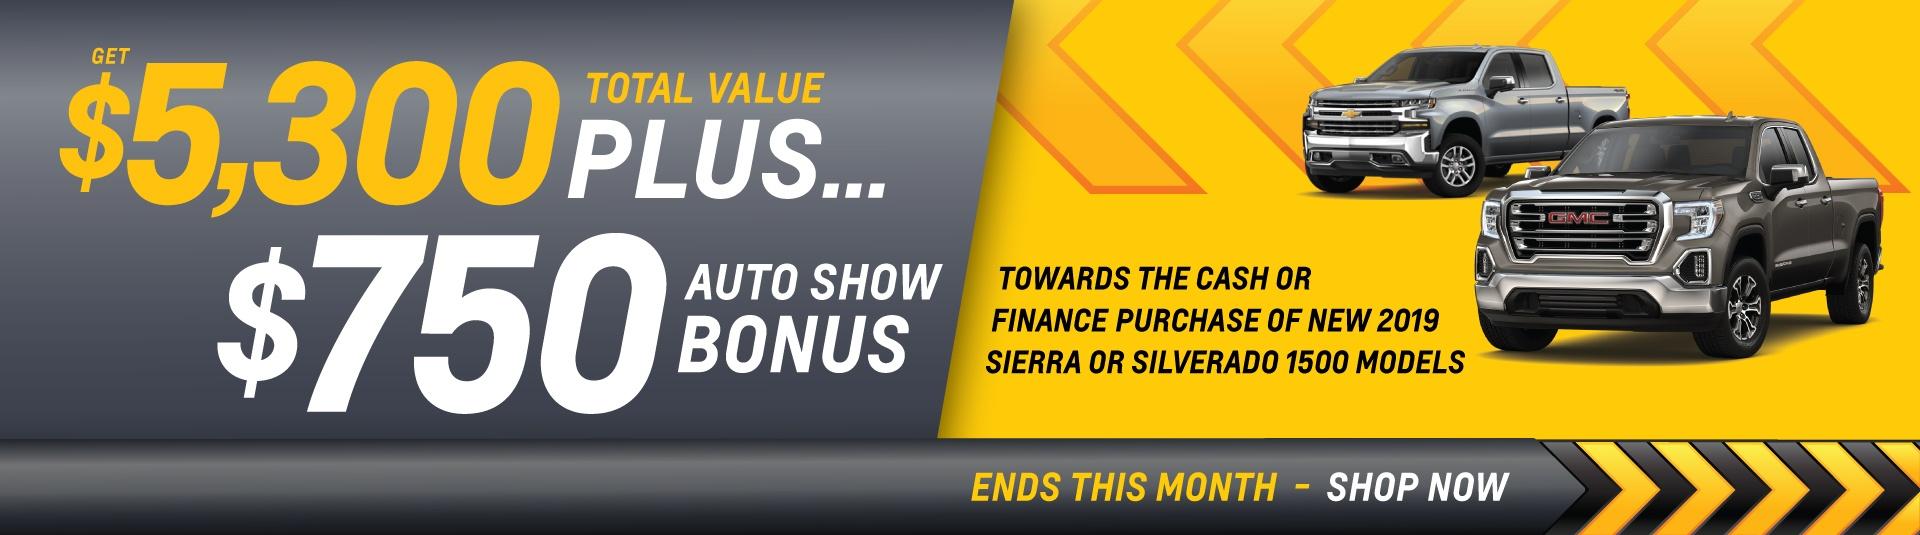 GM auto bonus